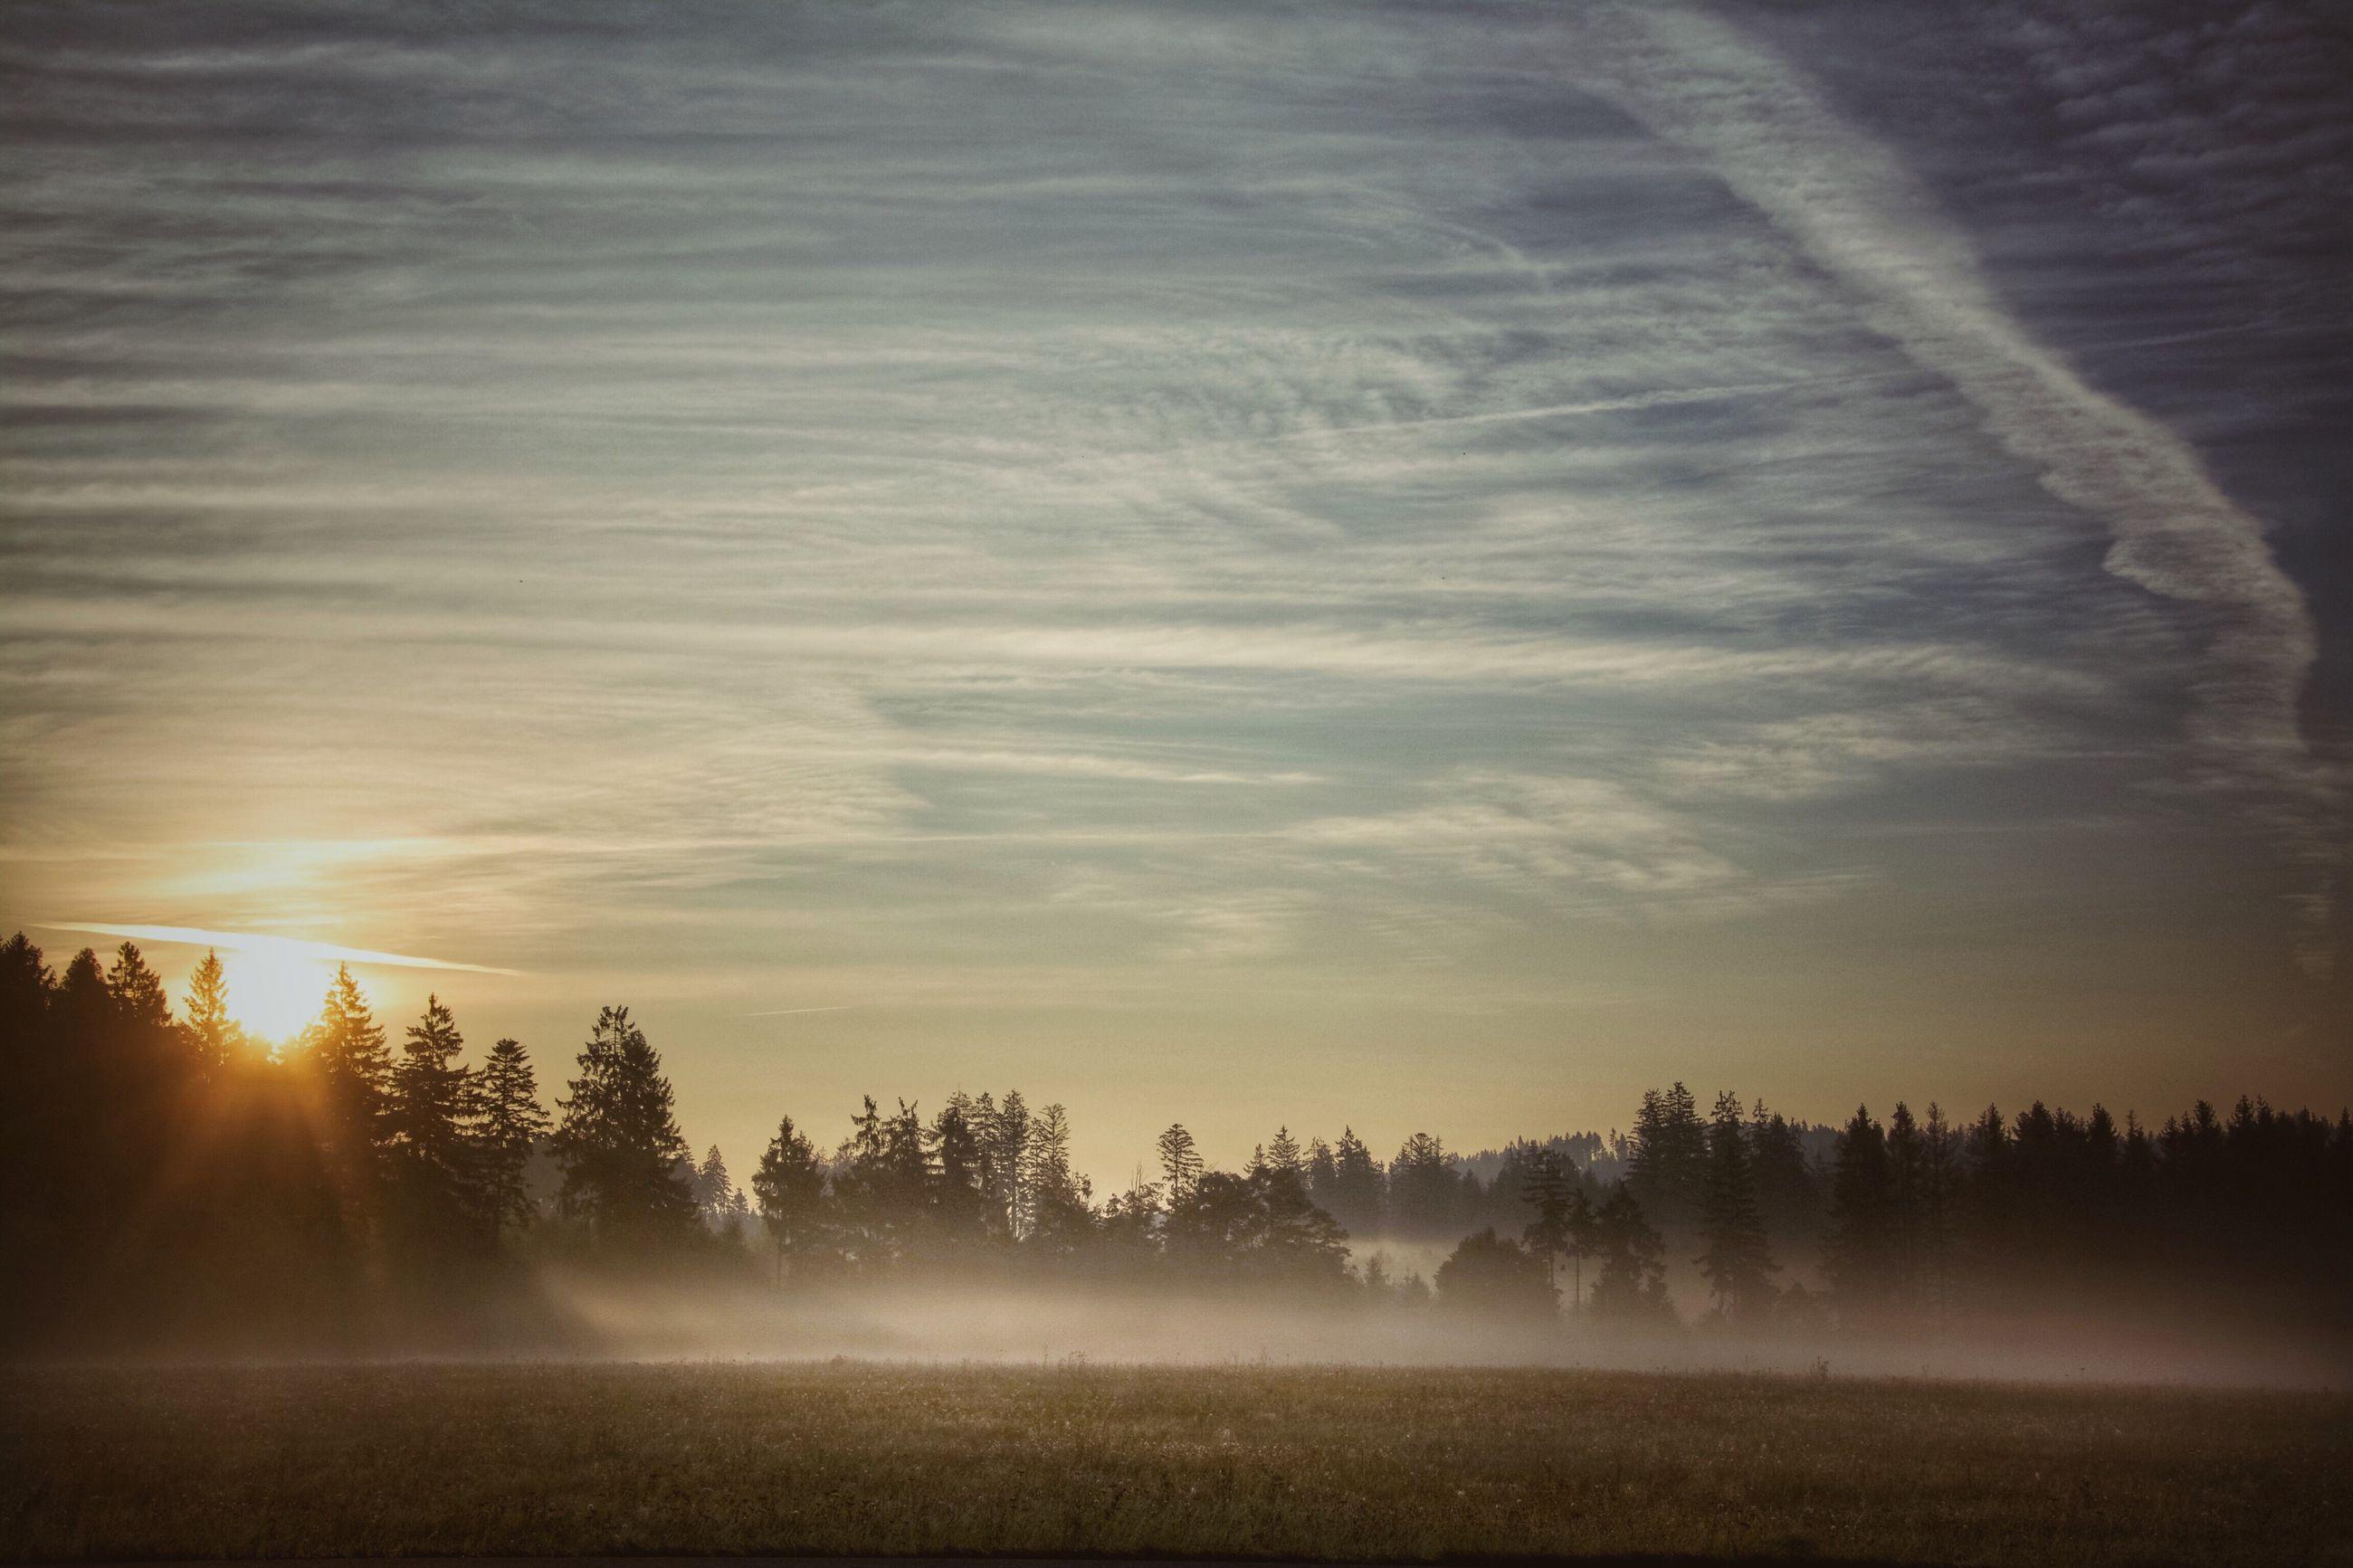 tree, tranquil scene, landscape, scenics, tranquility, sunset, silhouette, sky, nature, beauty in nature, sun, fog, cloud - sky, field, sunbeam, outdoors, non-urban scene, sunrise - dawn, rural scene, back lit, distant, solitude, mist, foggy, no people